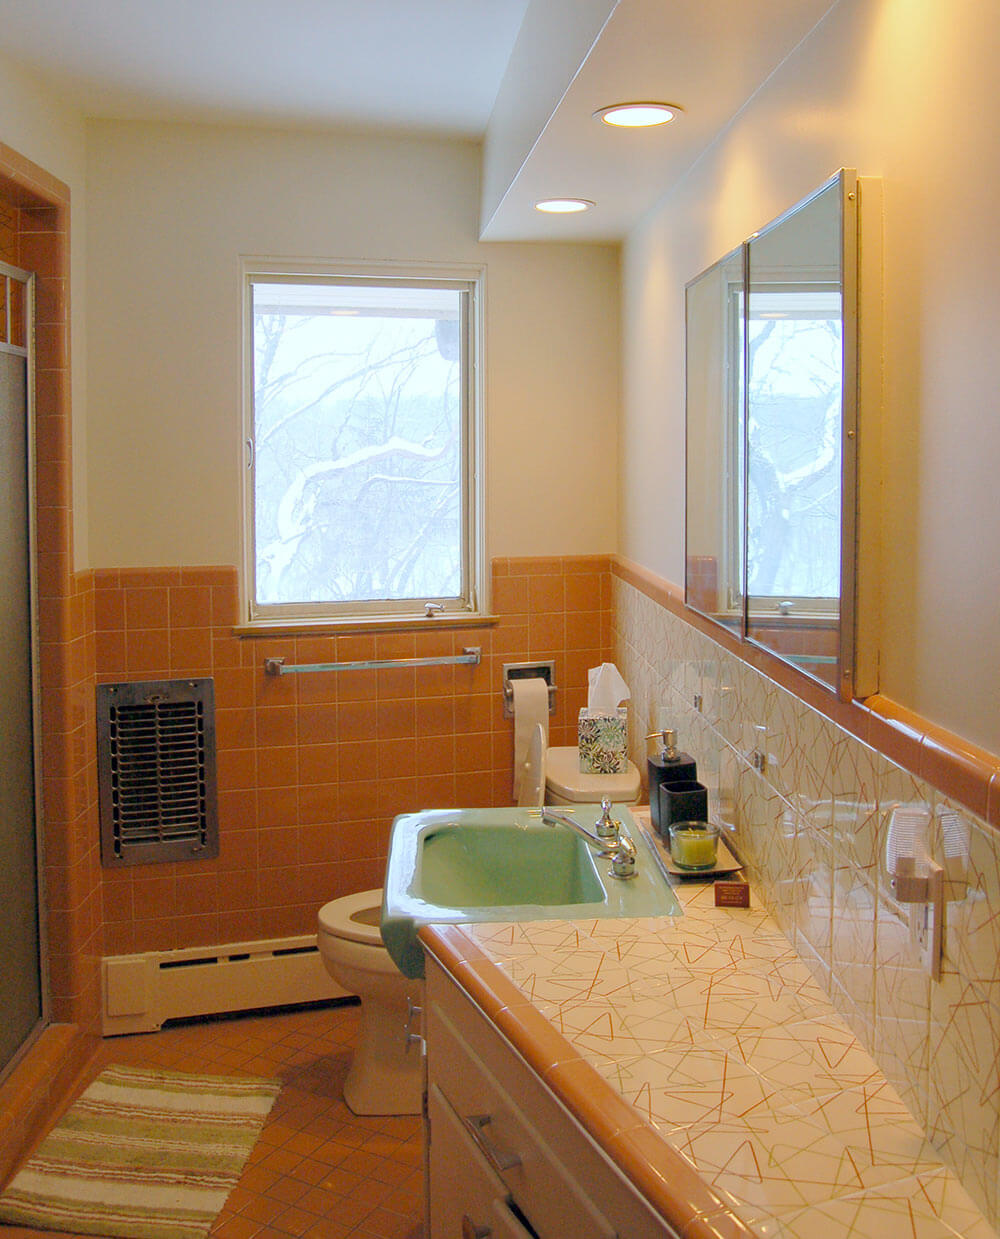 Mid Century Bathroom Tile: Spectacular Mosaic Tile Company Decorative Tiles In Roger